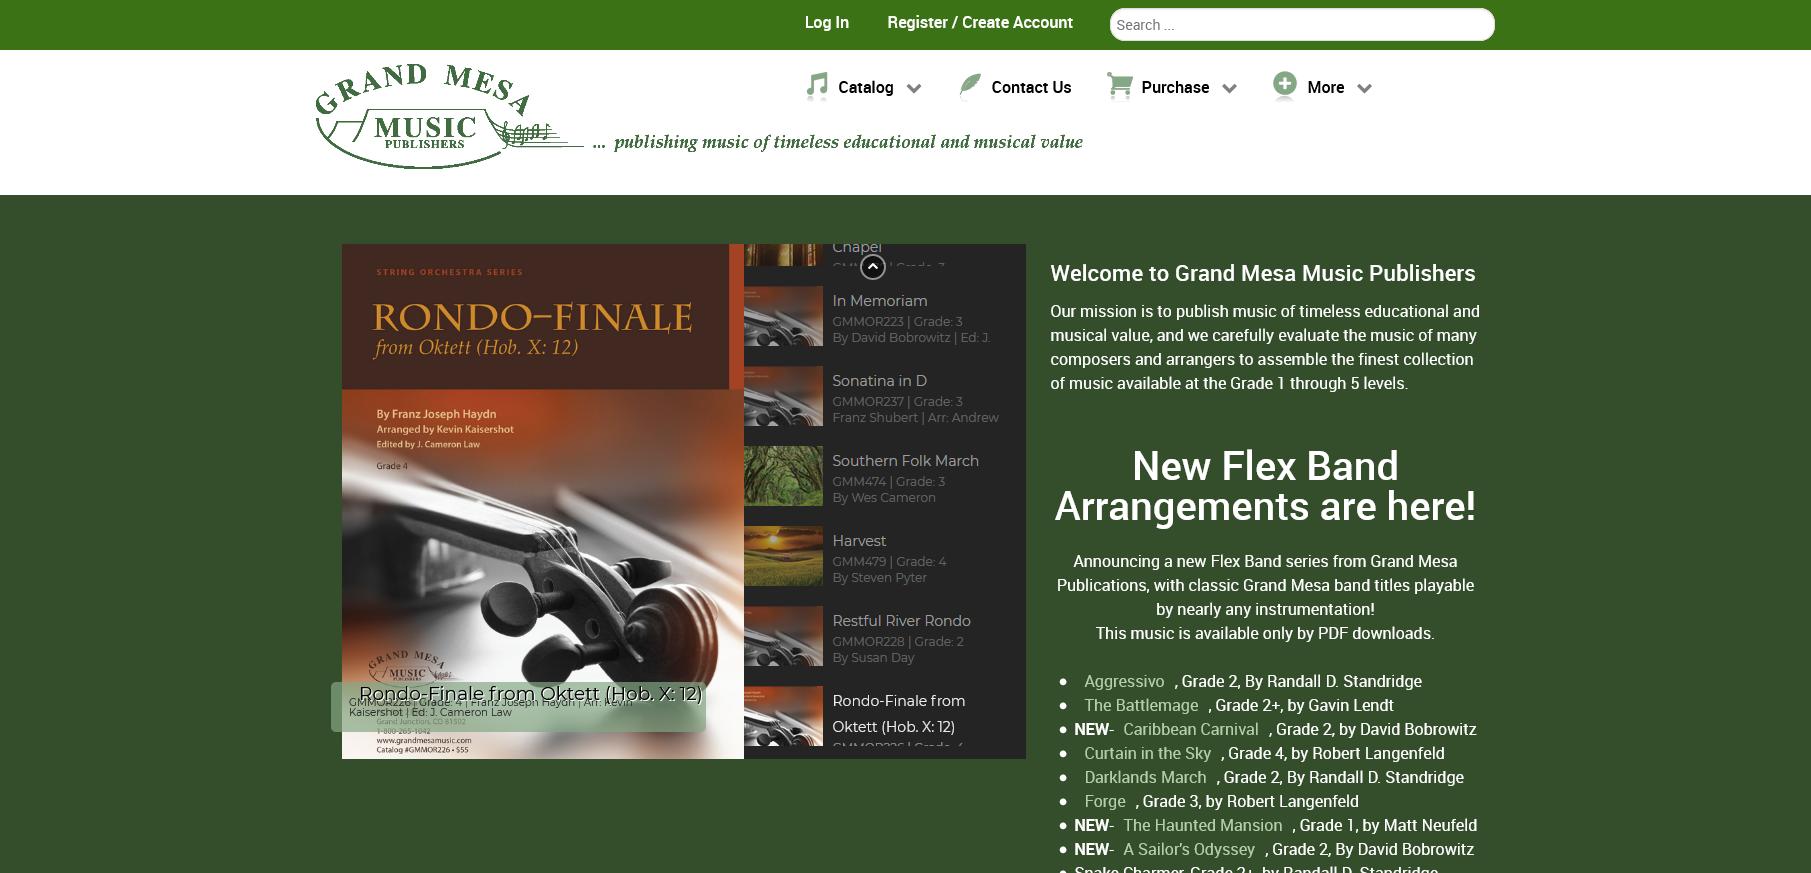 Grand Mesa Music Publishers